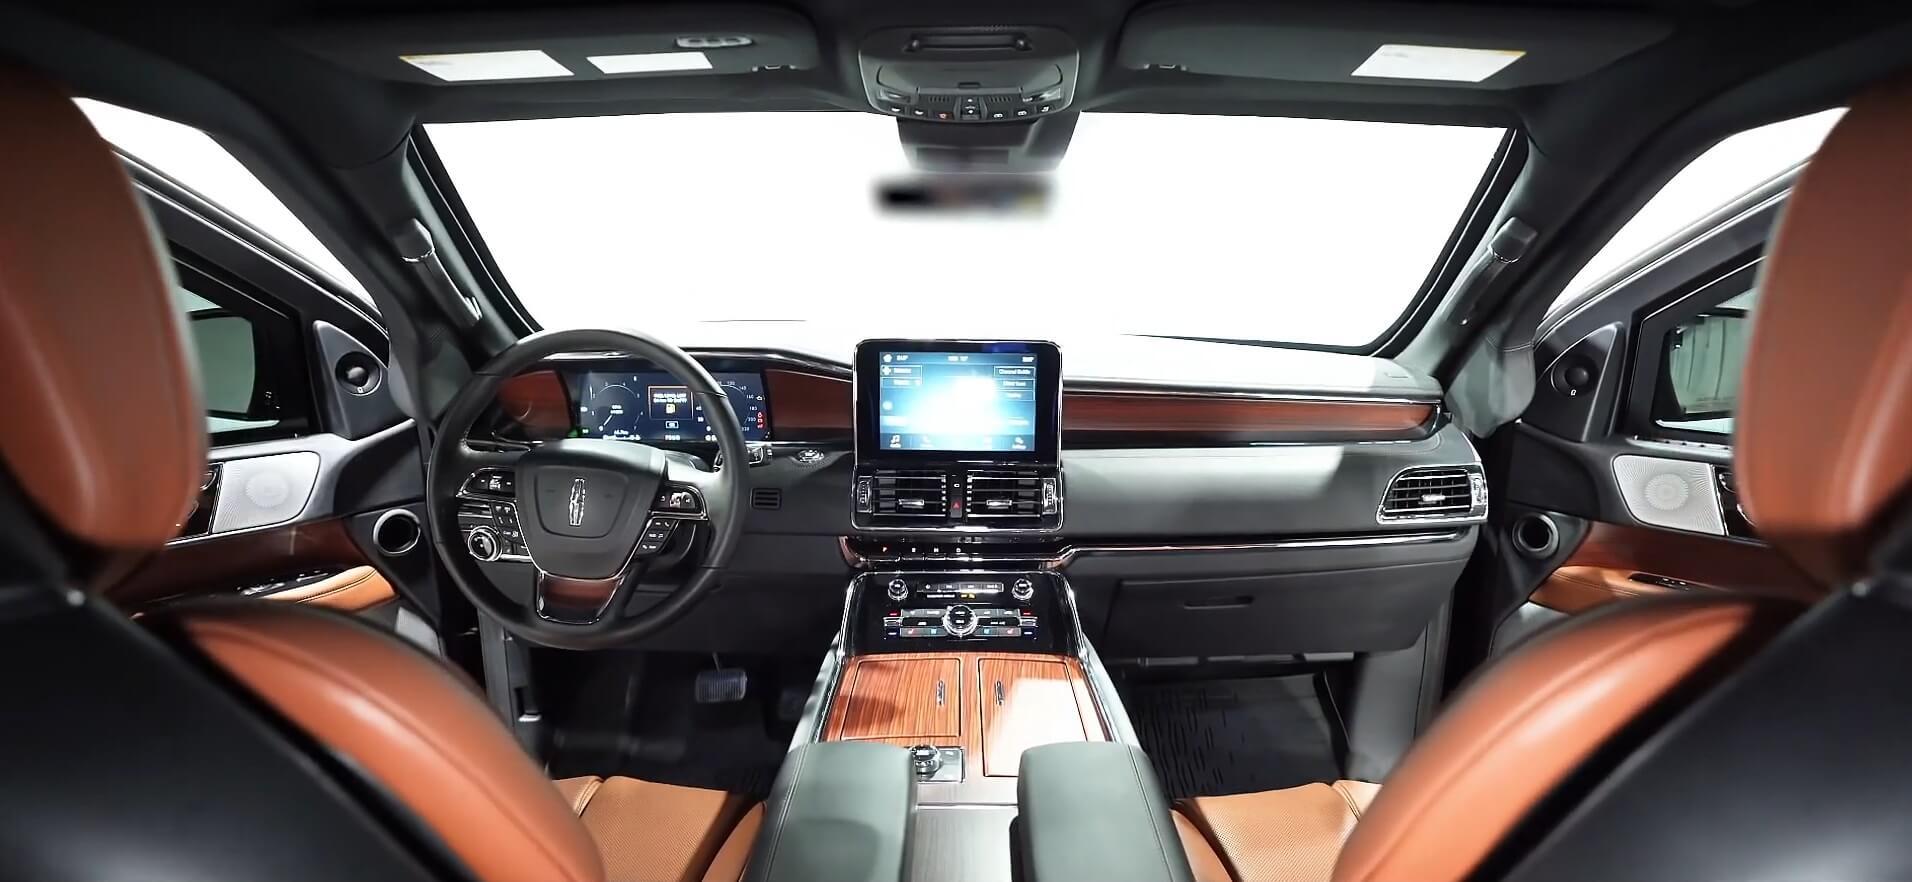 Lincoln-Navigator-L-By-Inkas-8